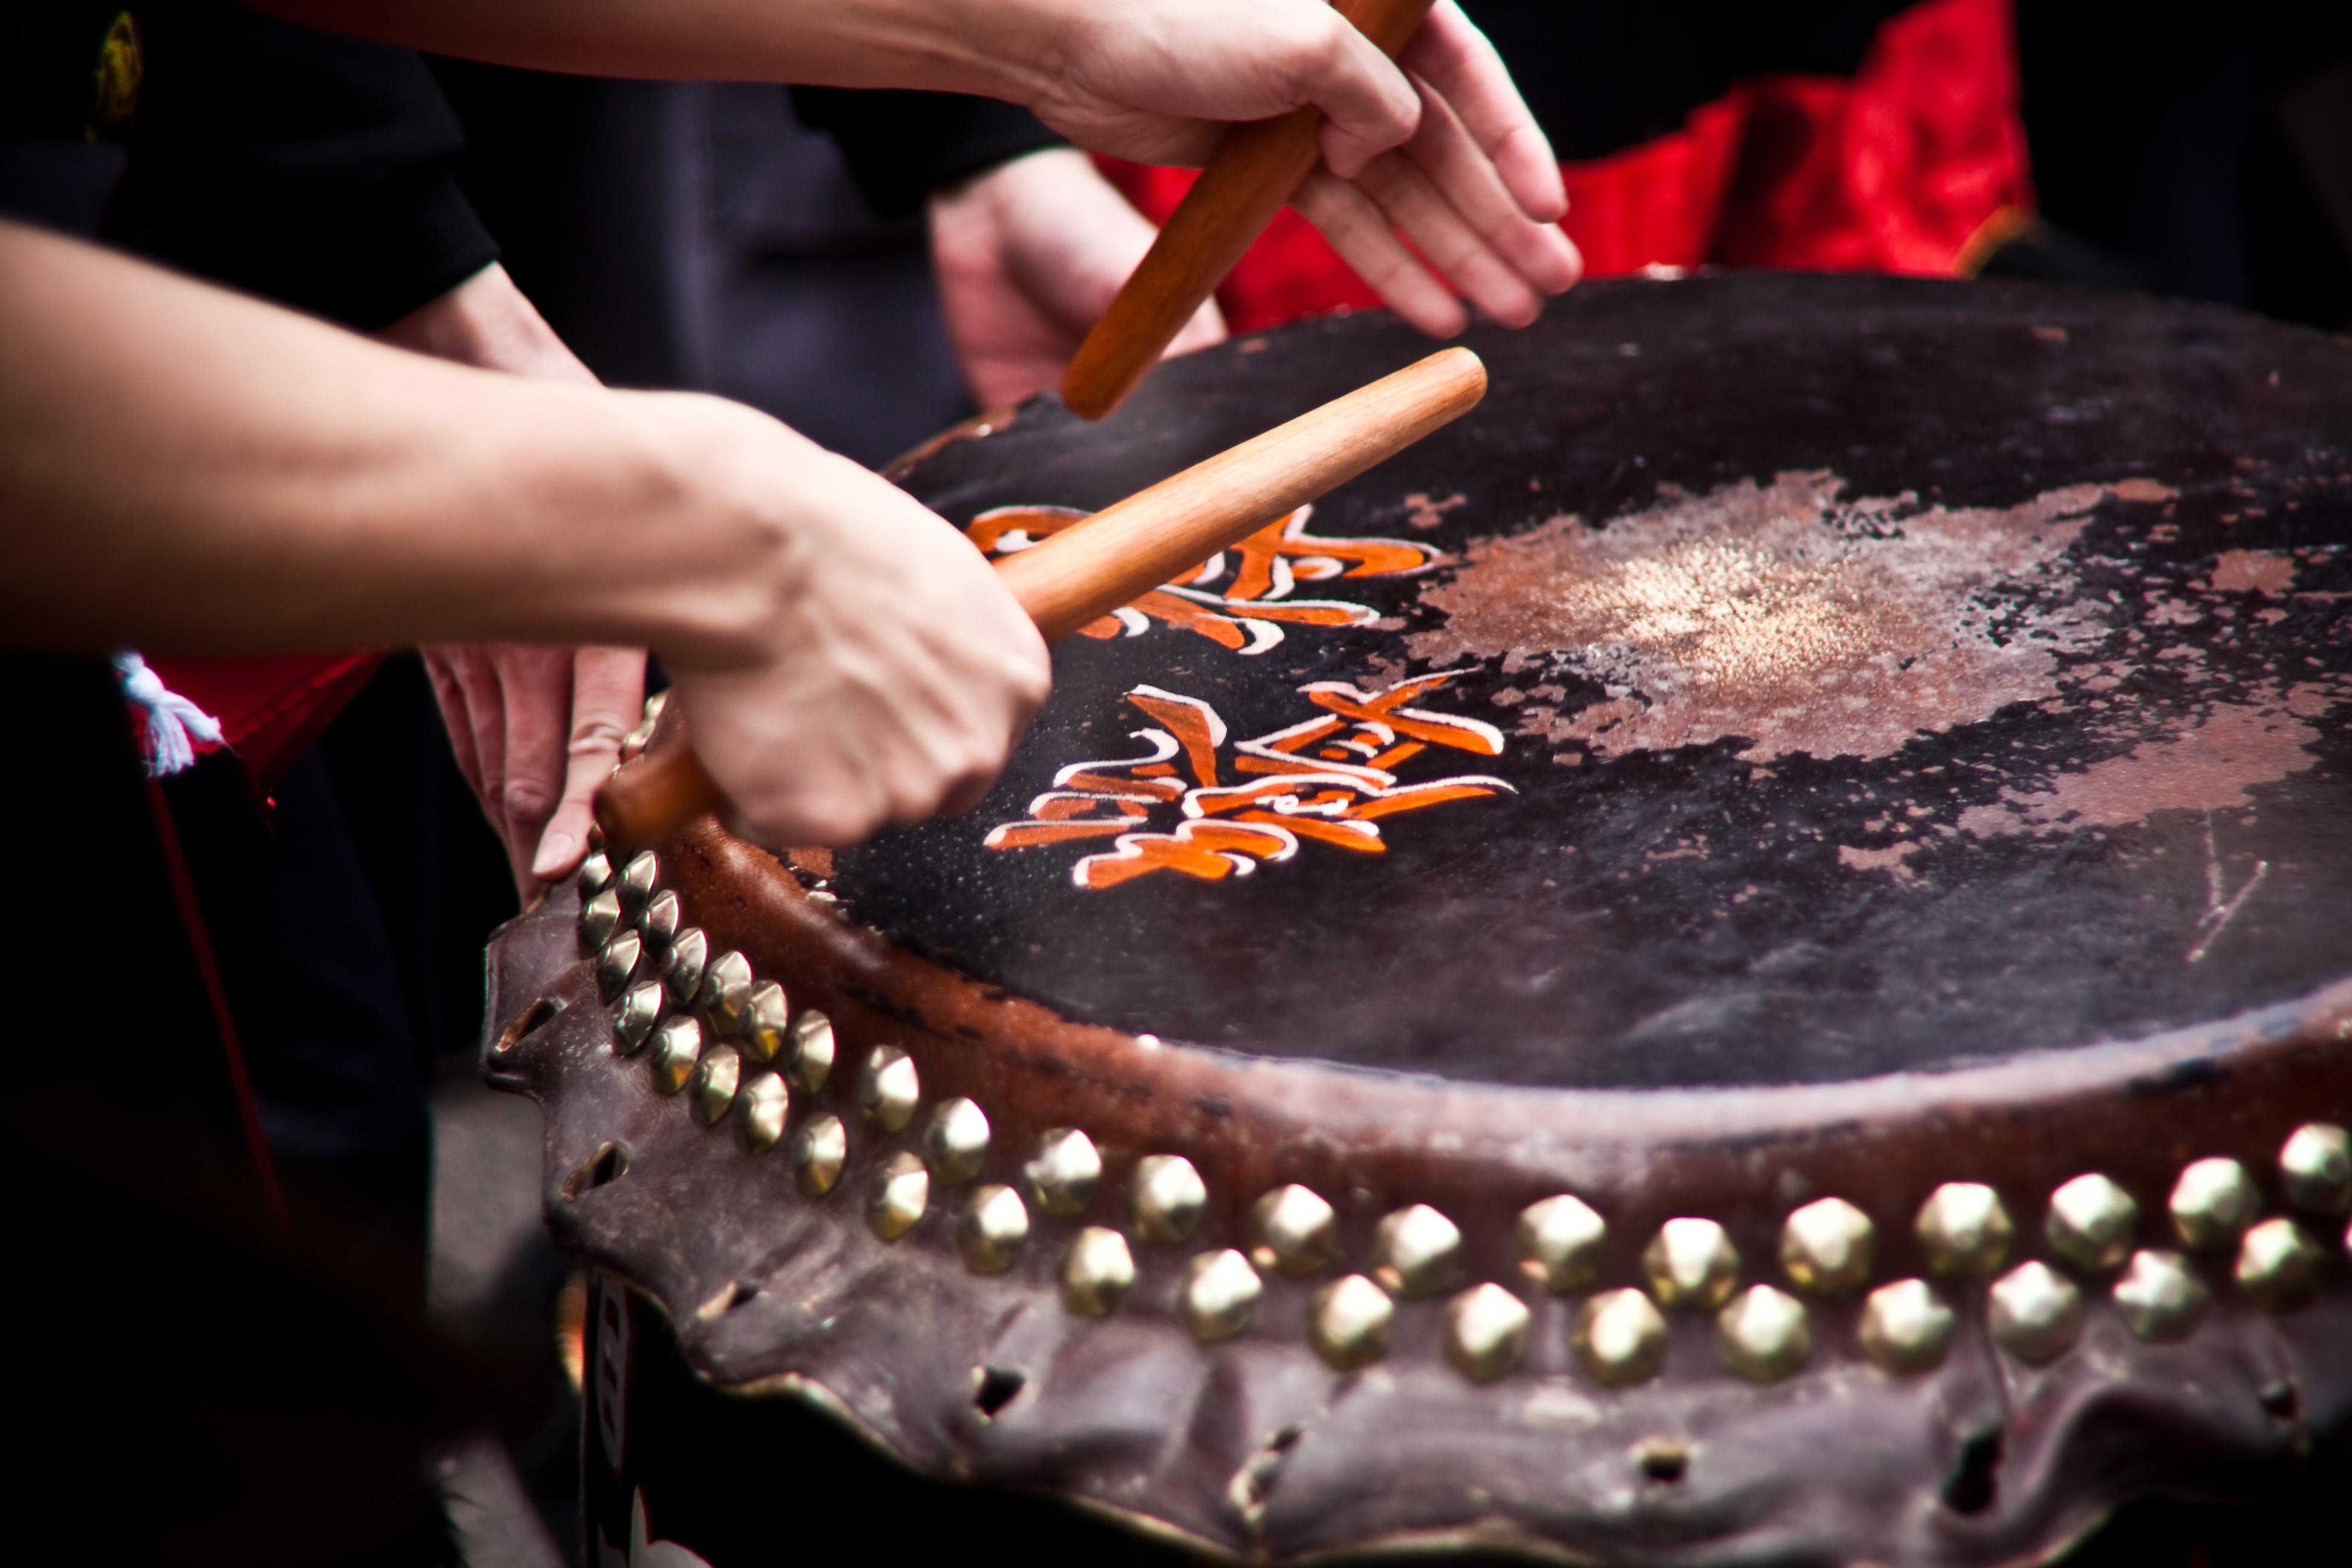 File:Chinese Drum (photo by Garry Knight).jpg - Wikimedia ...